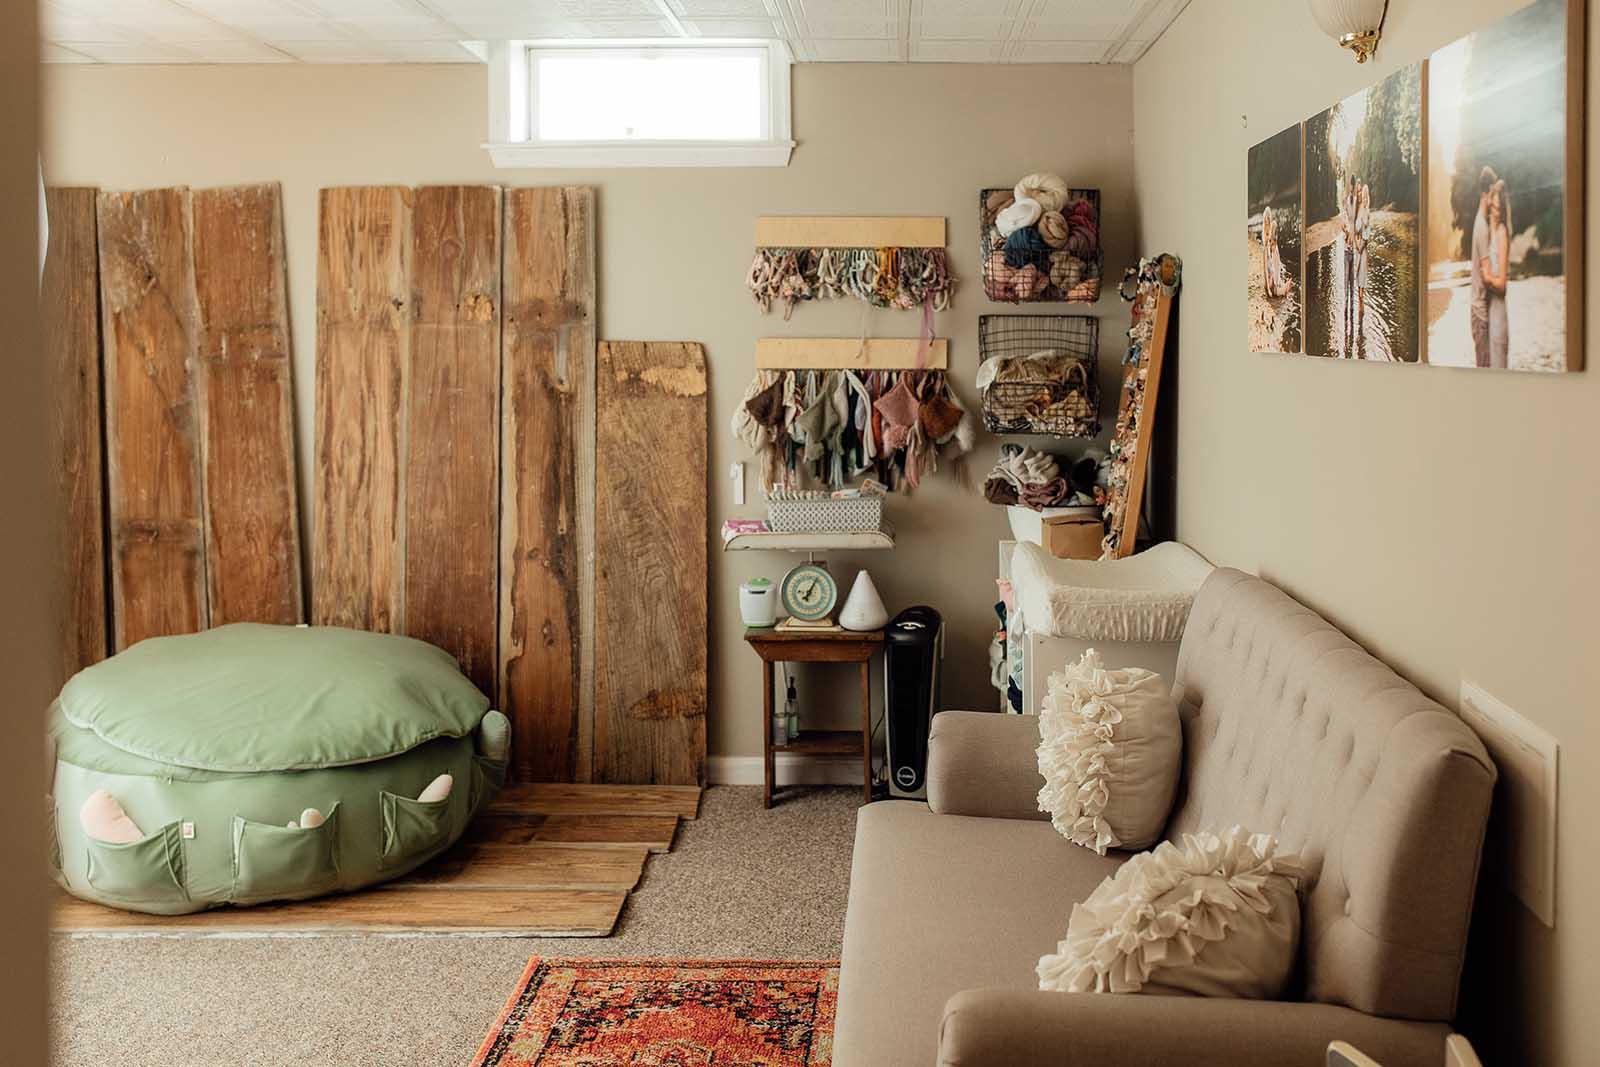 Winnie Bruce's newborn photography studio